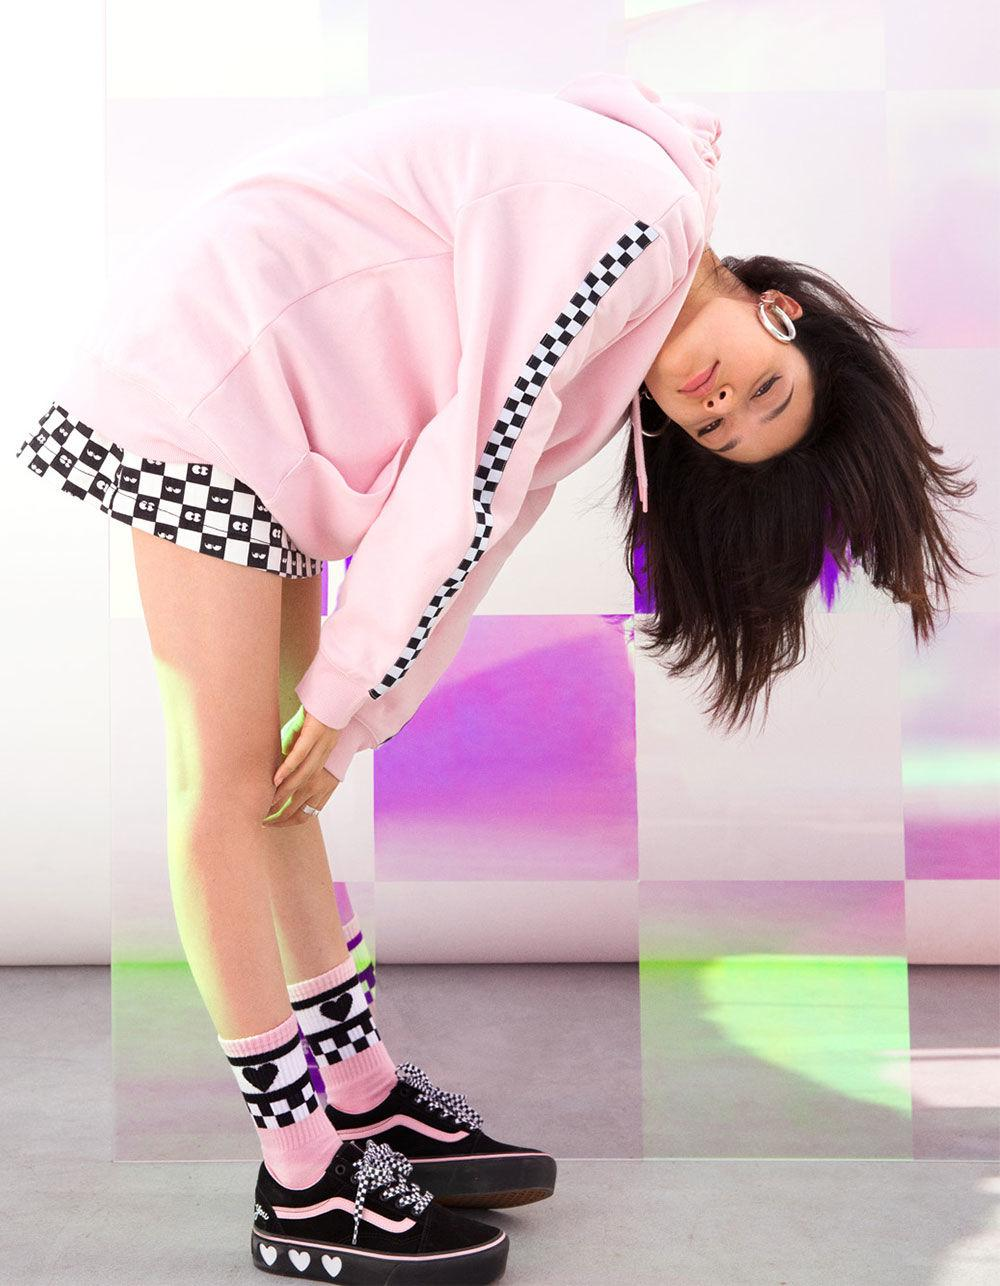 dbdb3a865ba1a1 Lyst - Vans X Lazy Oaf Almond Blossom Womens Socks in Pink